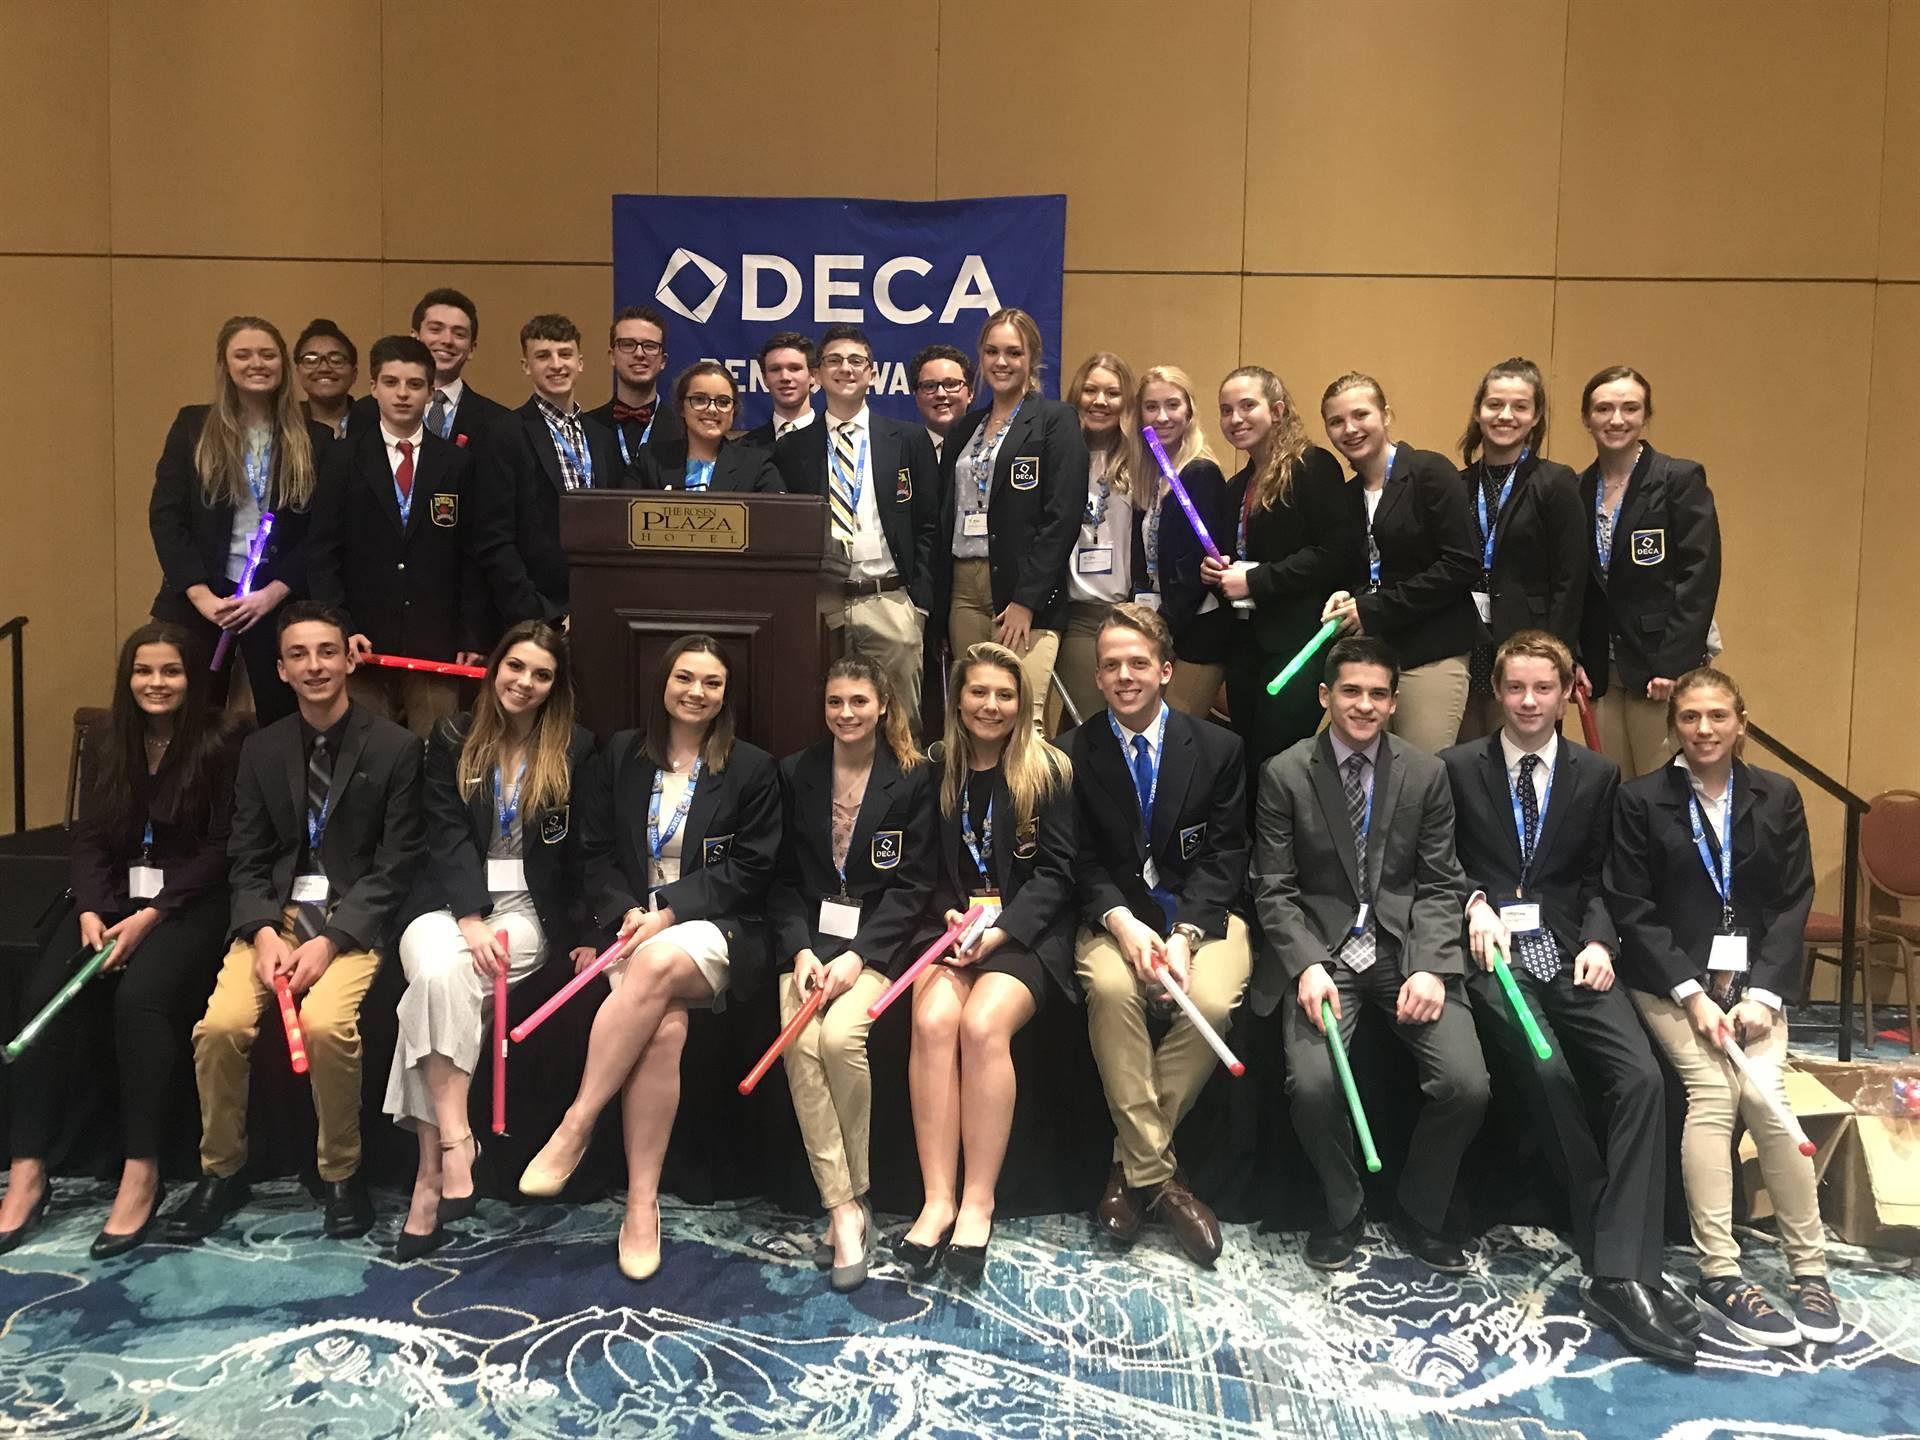 The DECA International Competitors